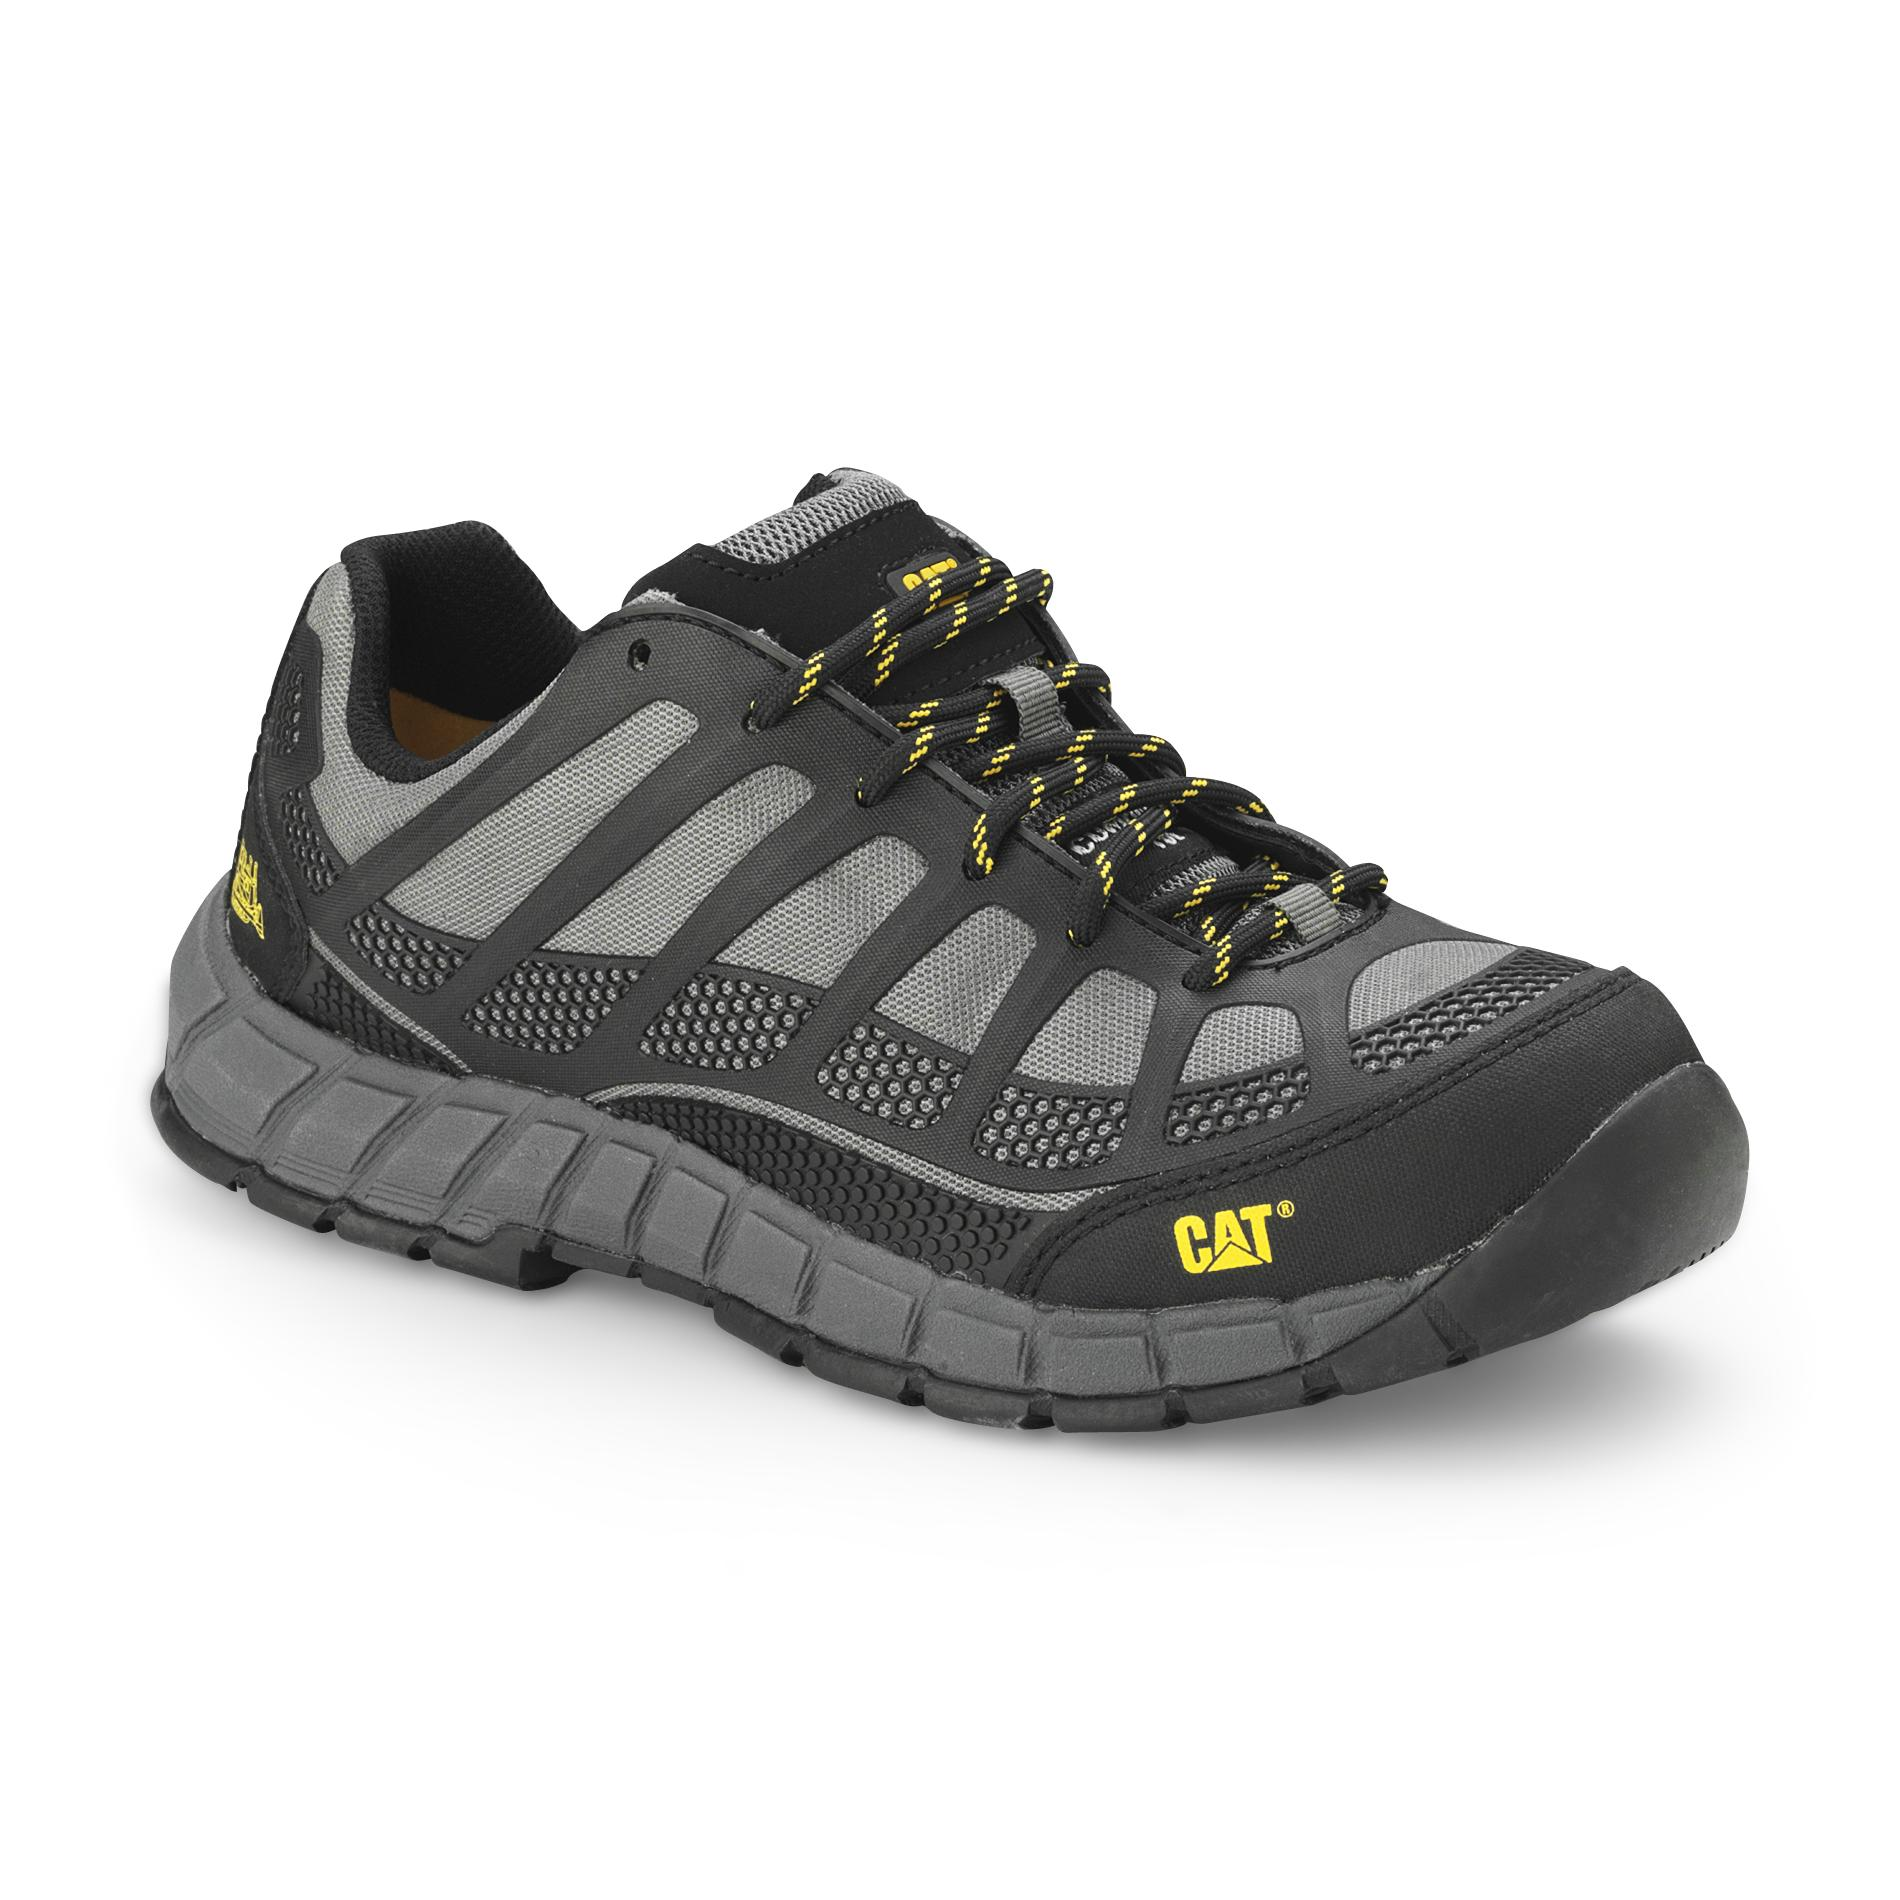 cat shoes cat footwear menu0027s streamline composite toe work shoe p90285 -  charcoal/black yftbwkw